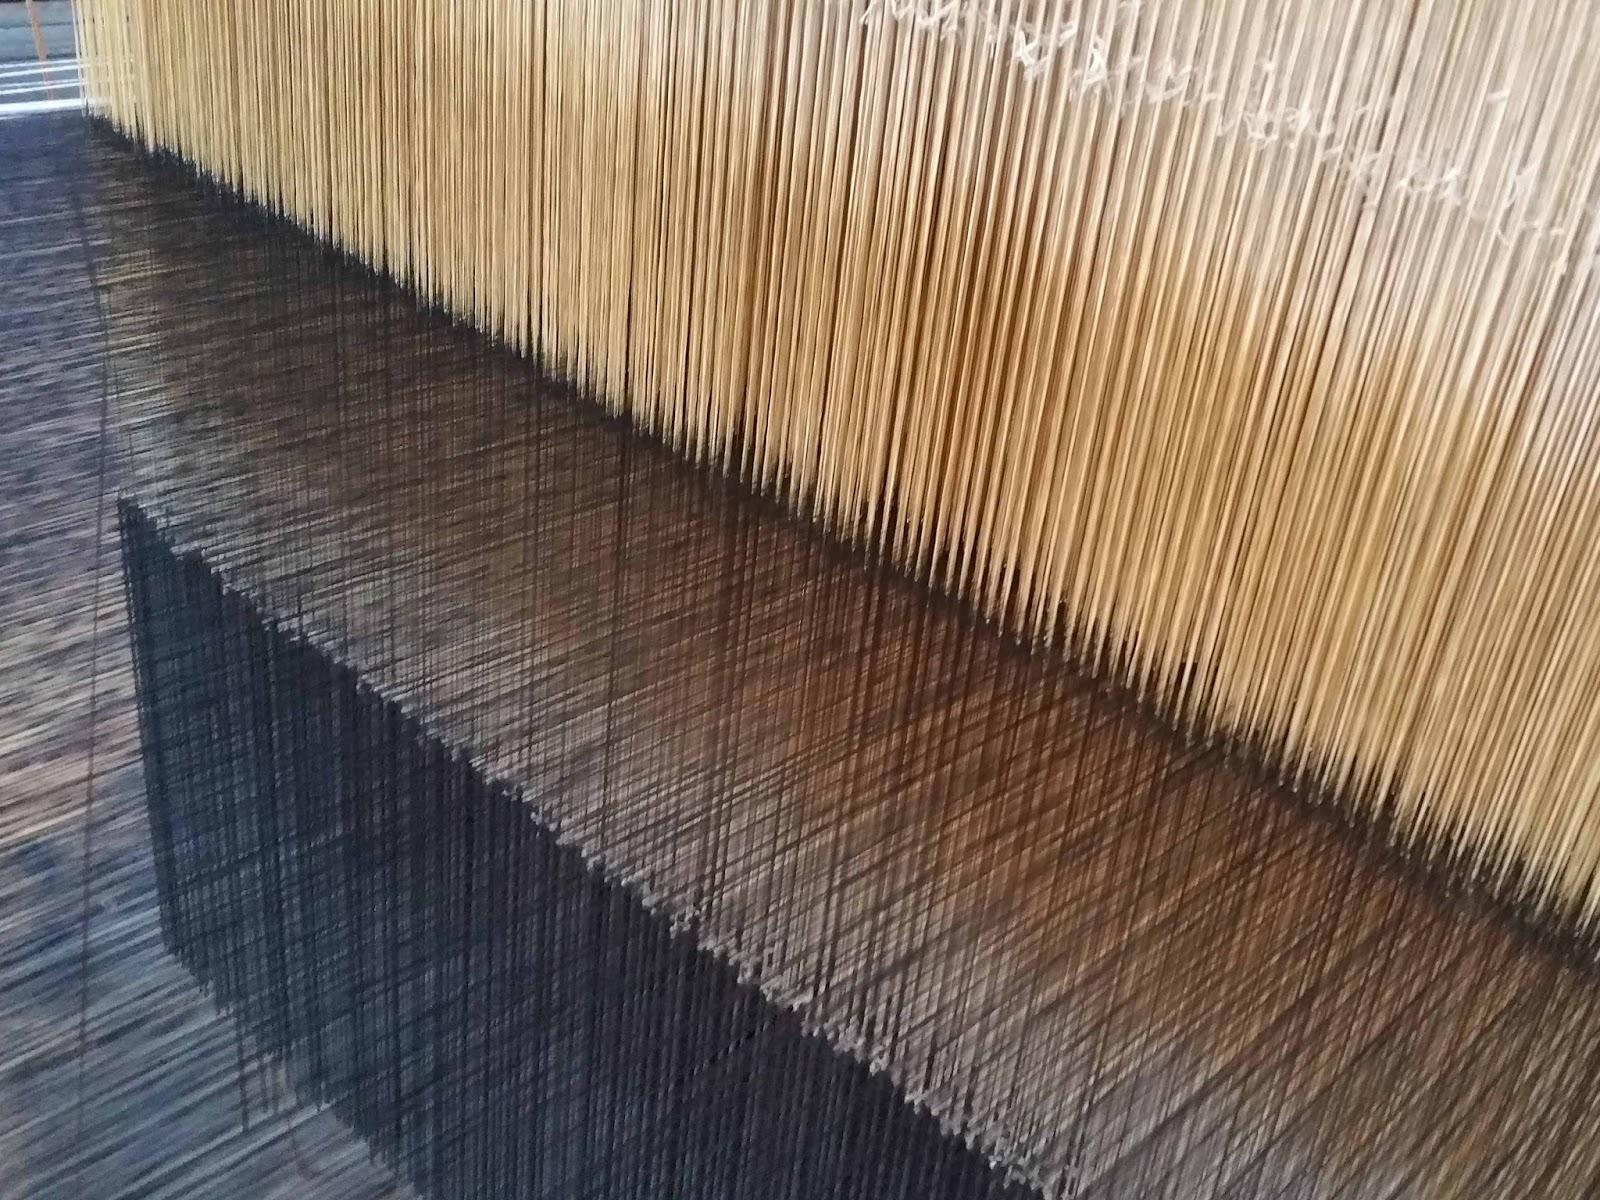 Somerset Stitch: Sumptious Silk - Paradise Mill, Macclesfield